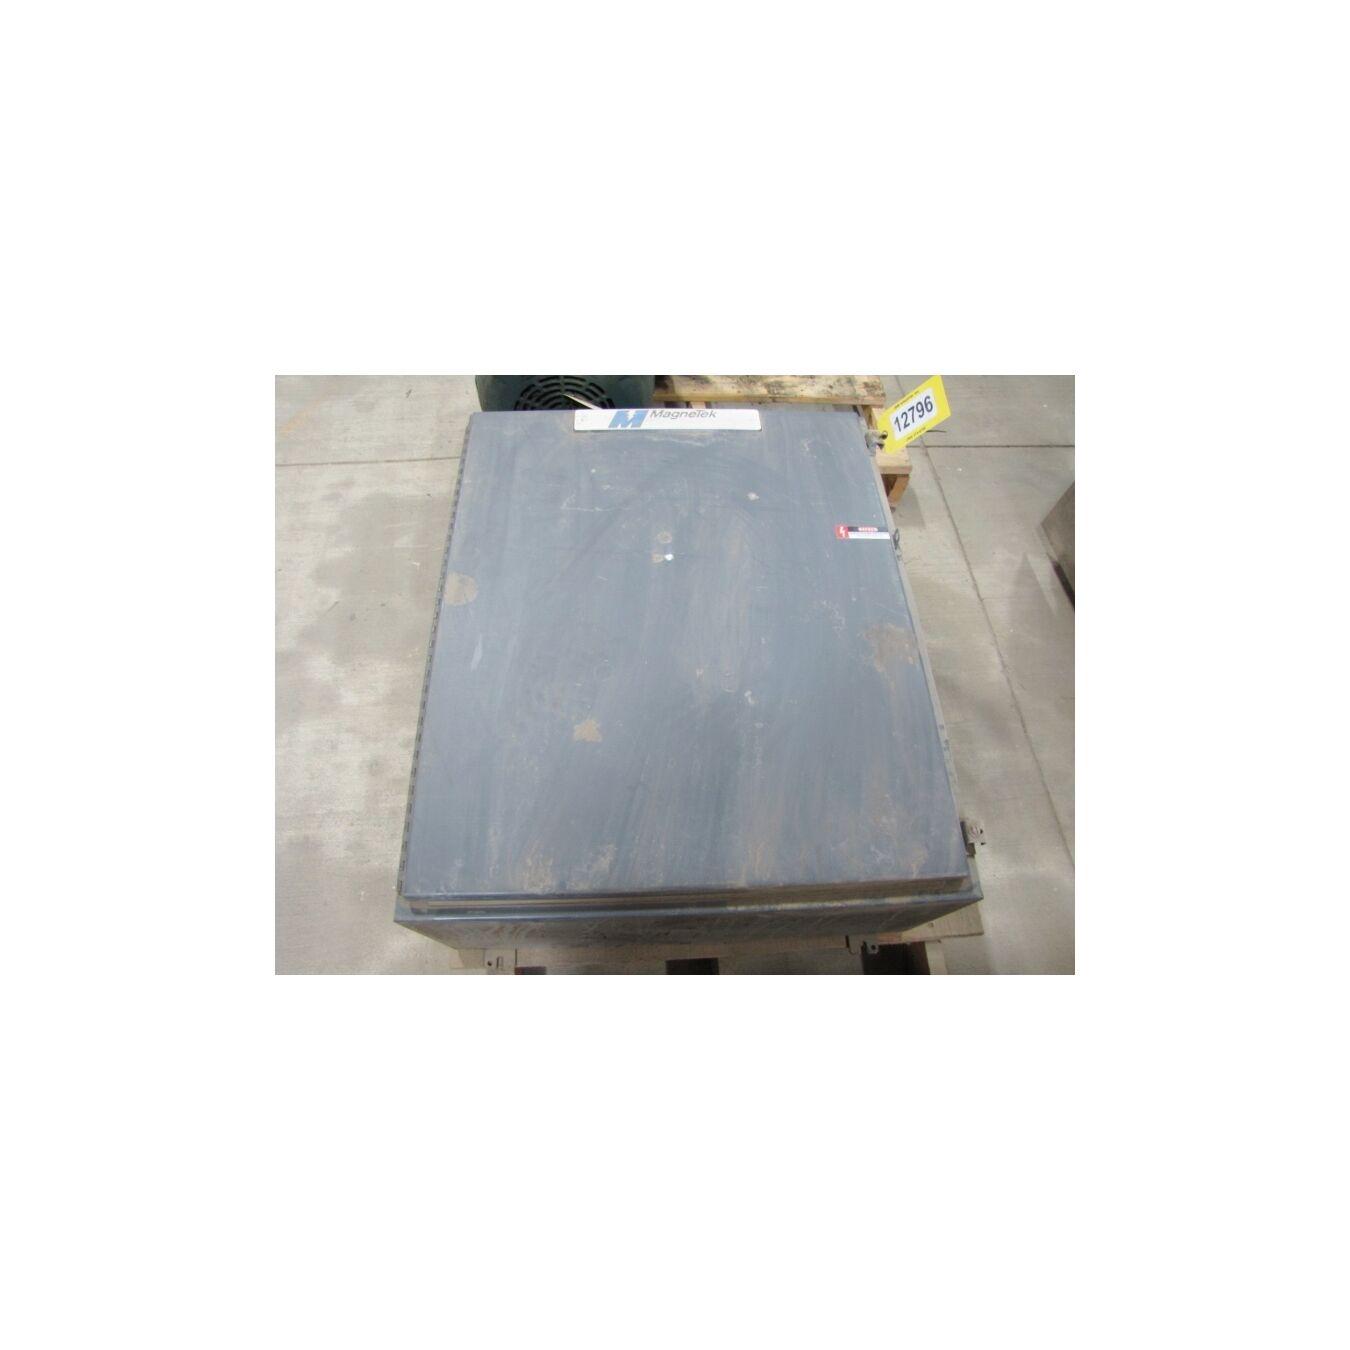 Used Magnetek Vfd In Enclosure 20hp Electrical Equipment